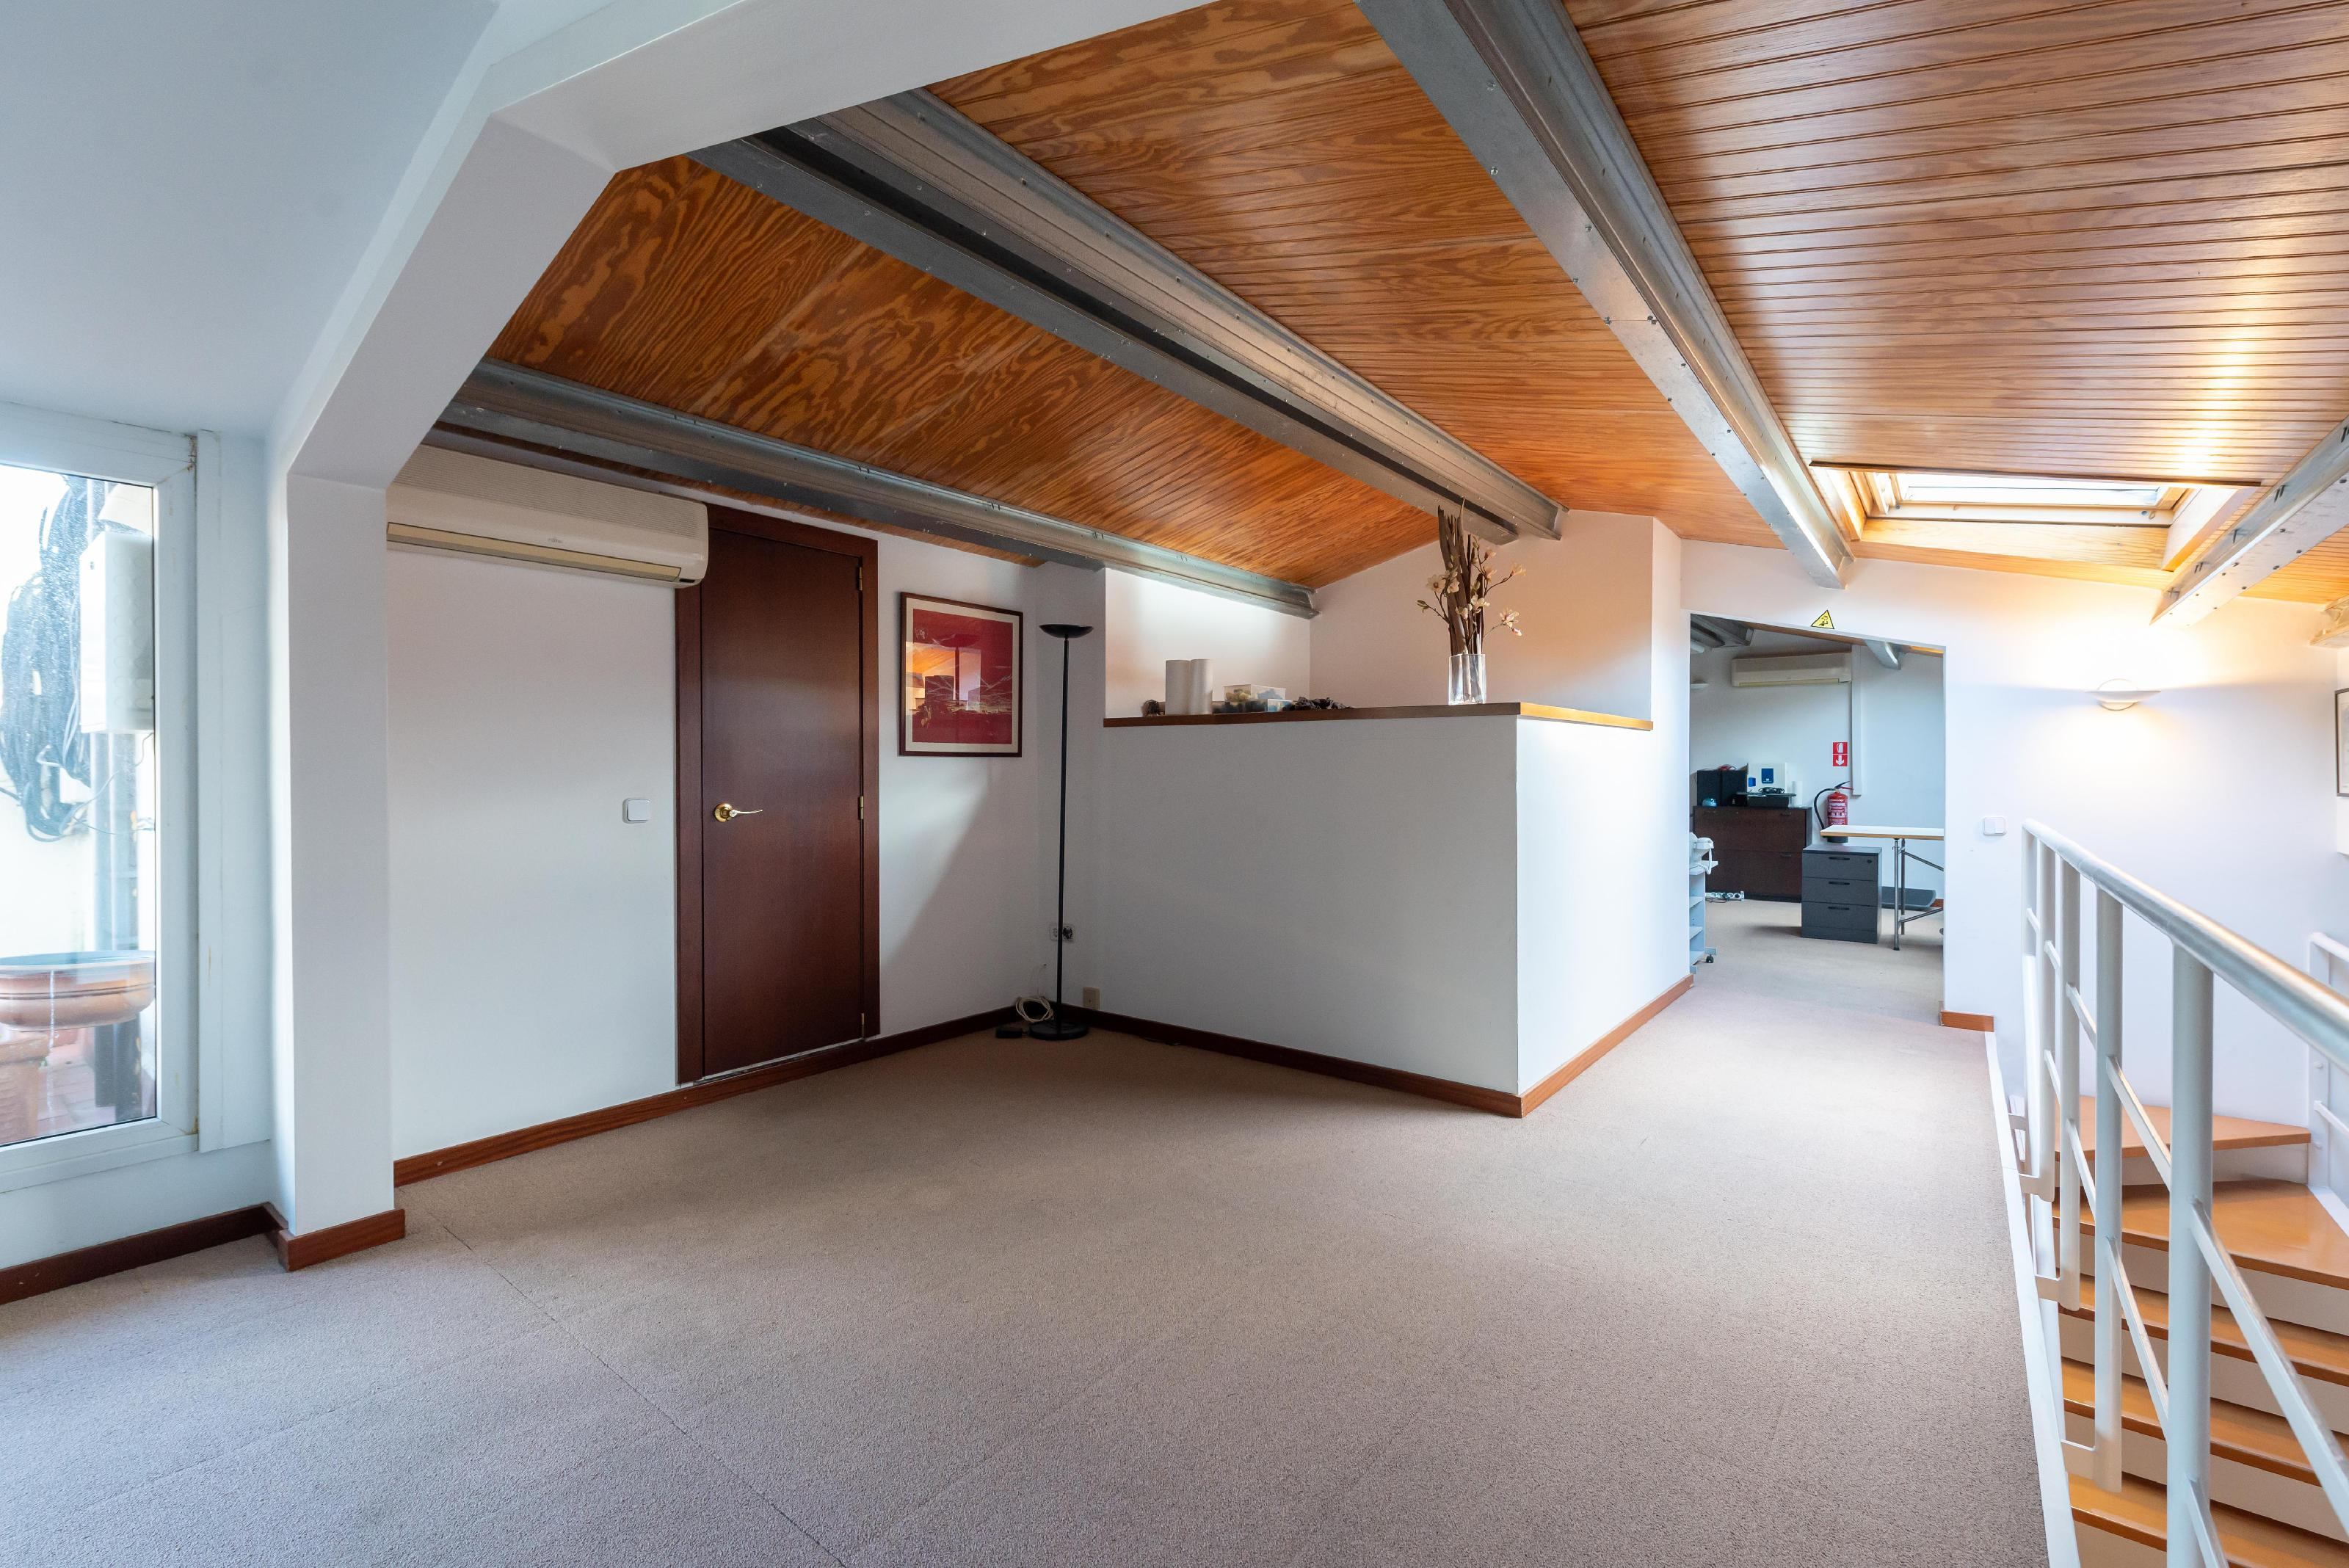 246066 Penthouse for sale in Sarrià-Sant Gervasi, Sarrià 13